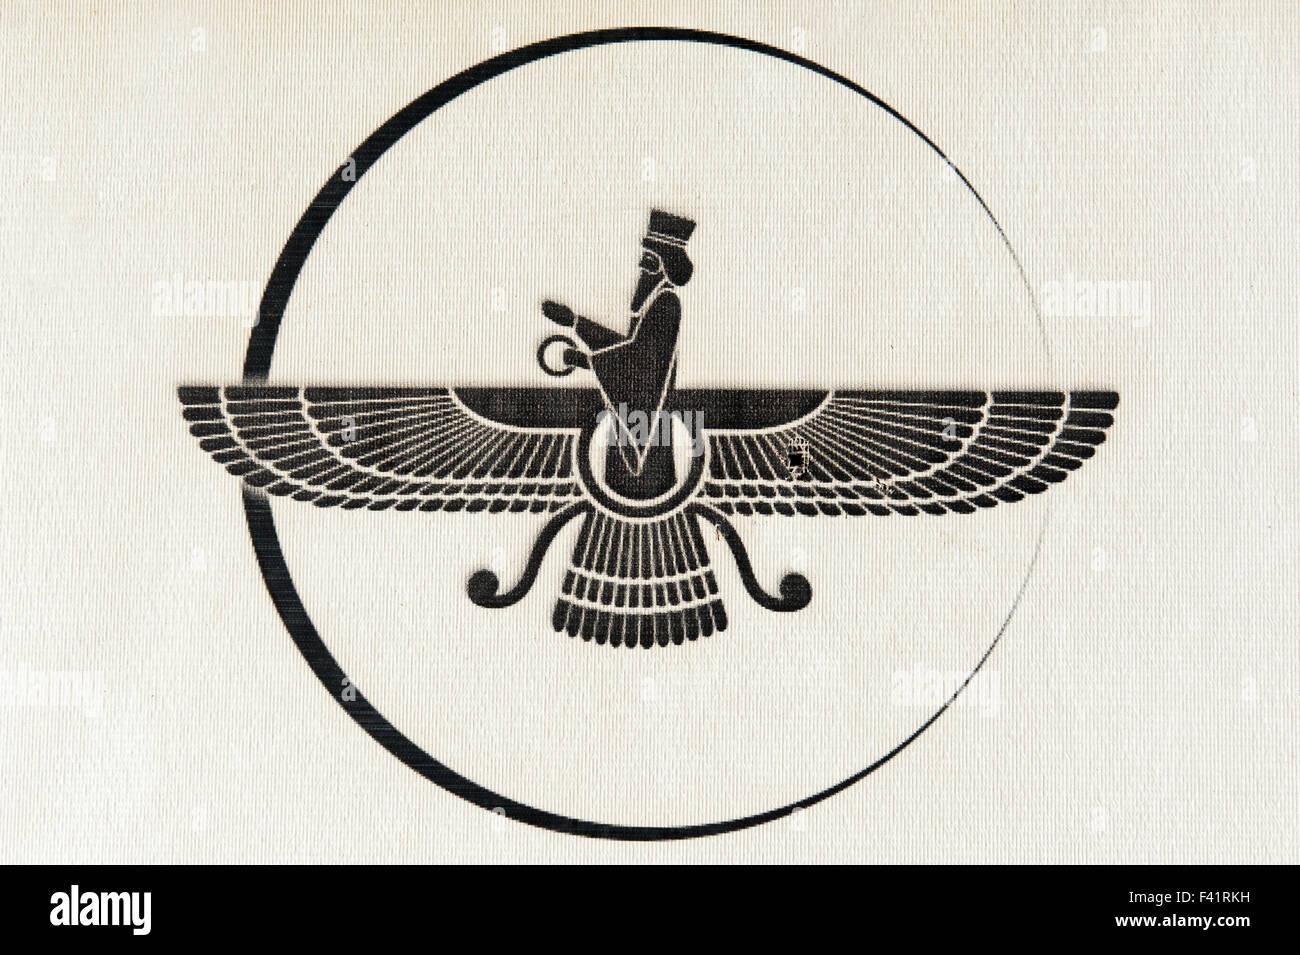 Symbol of deity stock photos symbol of deity stock images alamy symbol of zoroastrianism faravahar symbol for god ahura mazda yazd iran biocorpaavc Image collections